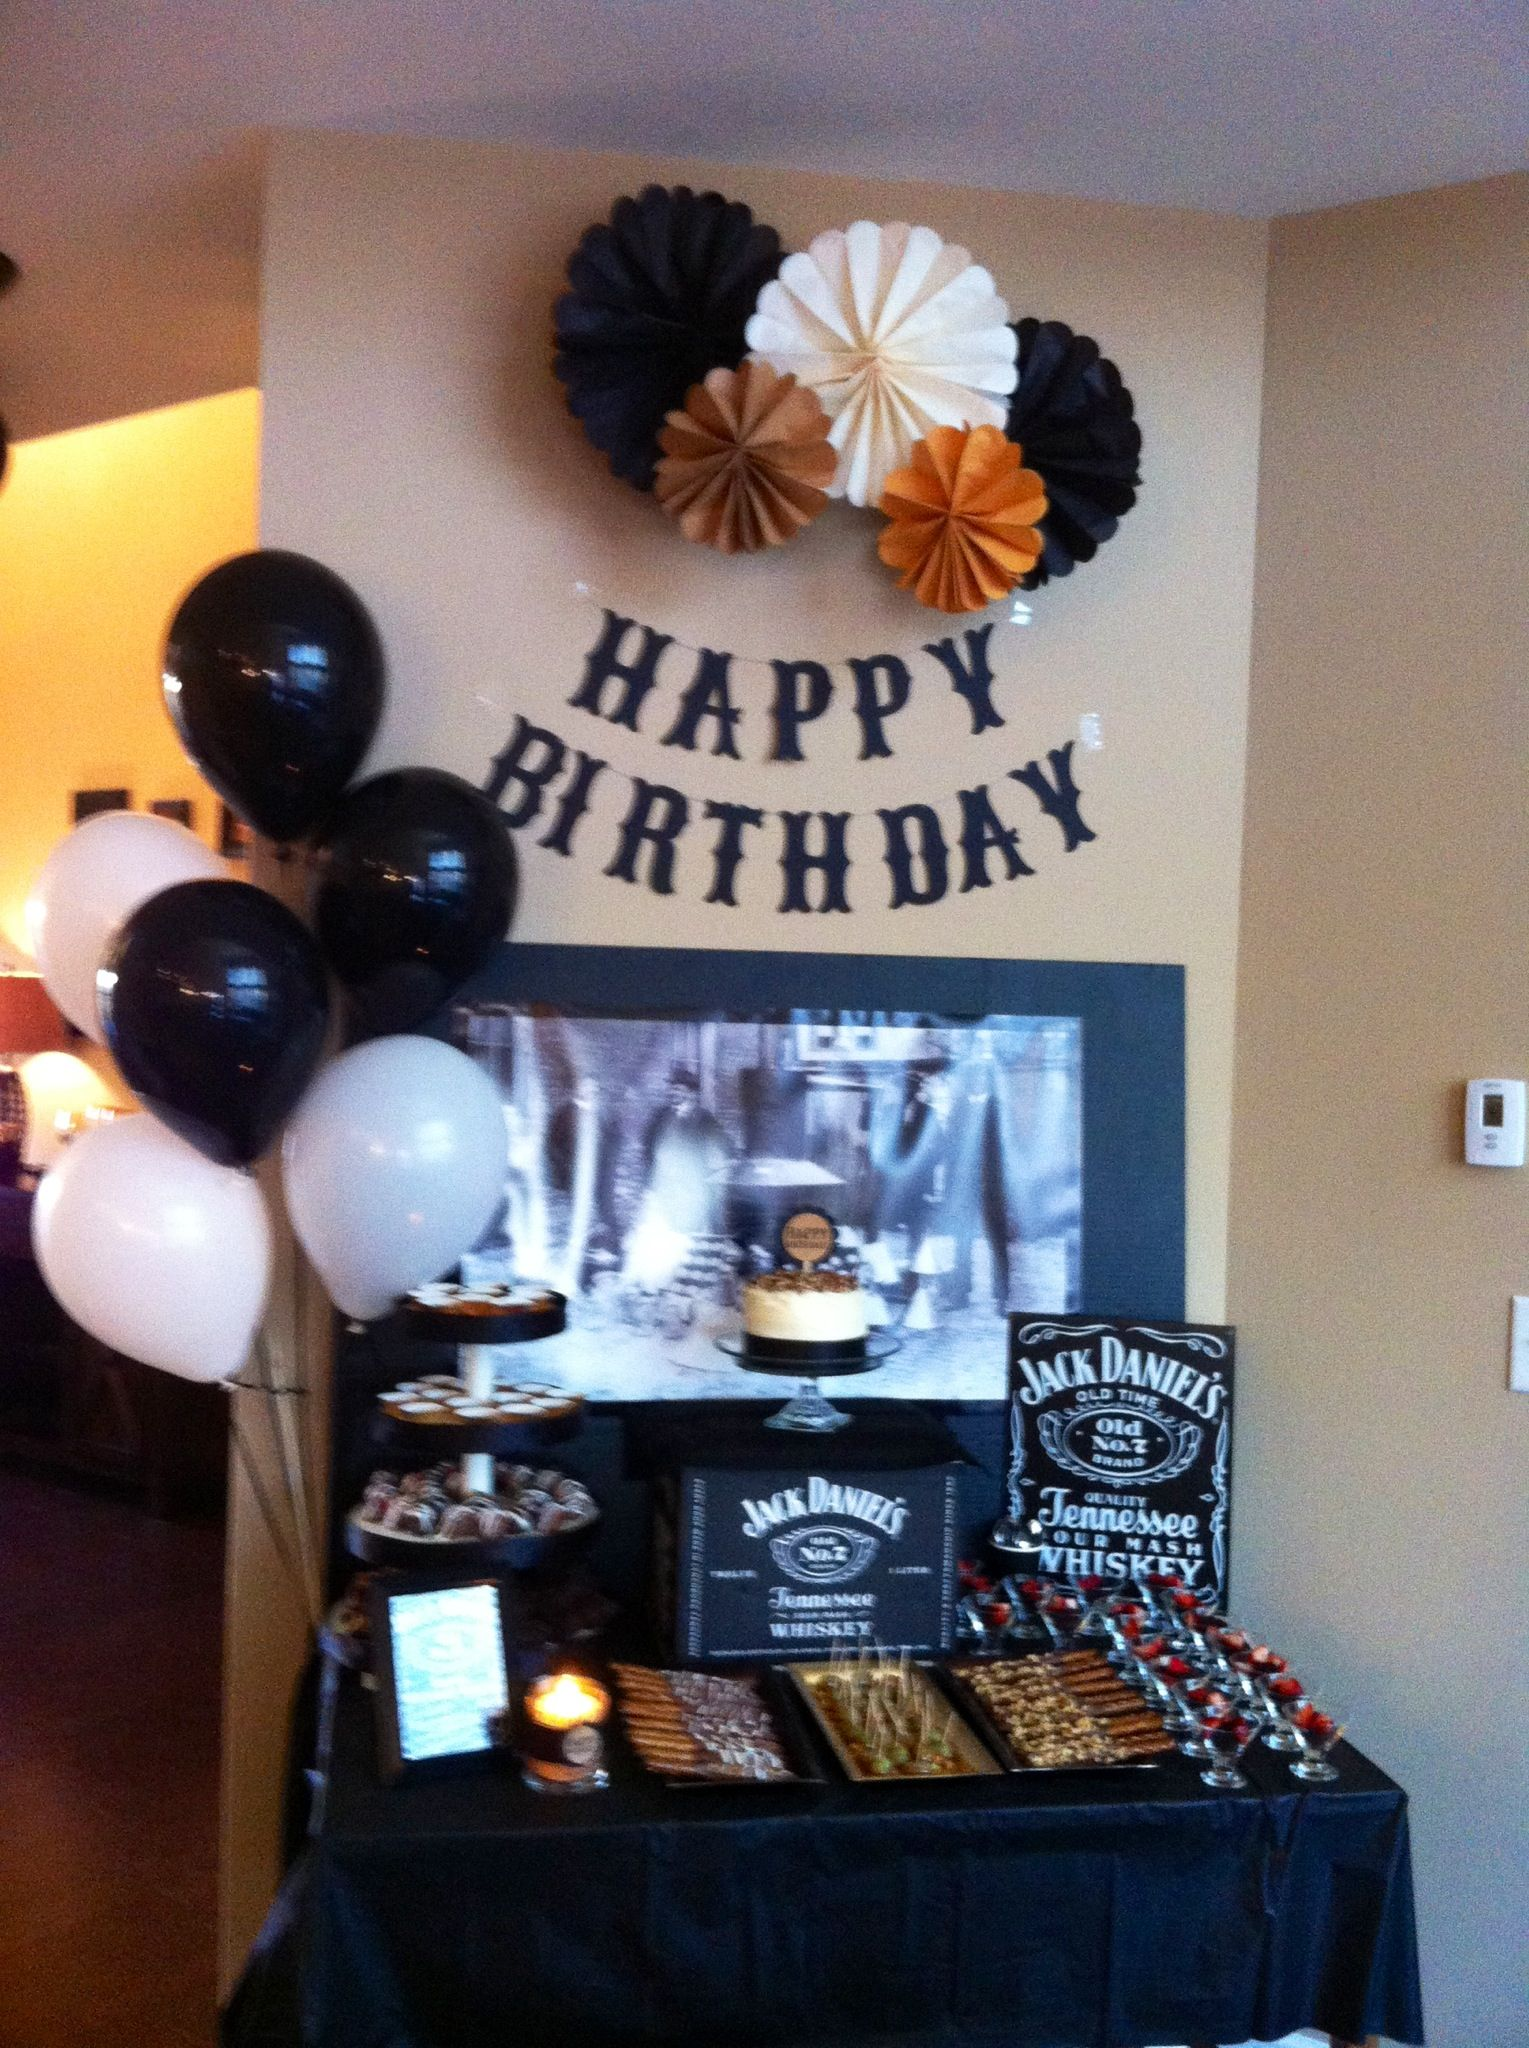 st birthday ts for guys jack daniels theme dad   surprise th bday party festa also th ideas husband pinterest rh cz